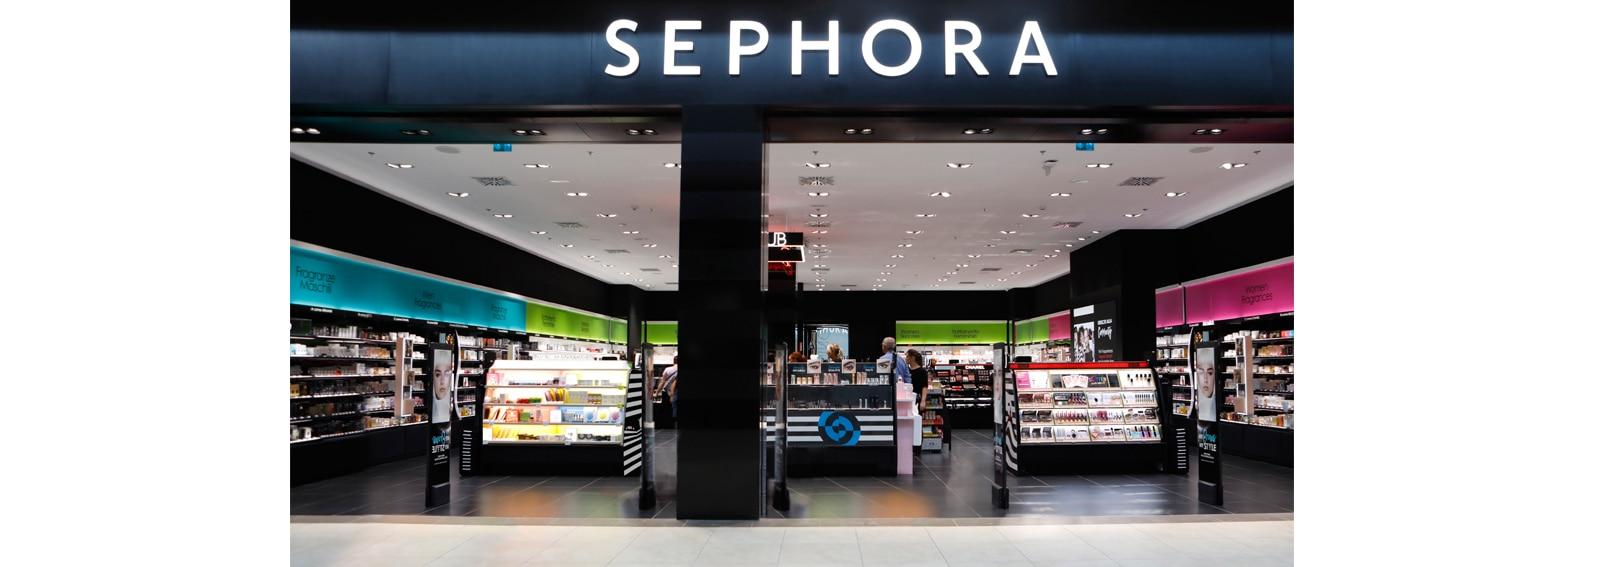 Sephora_hero